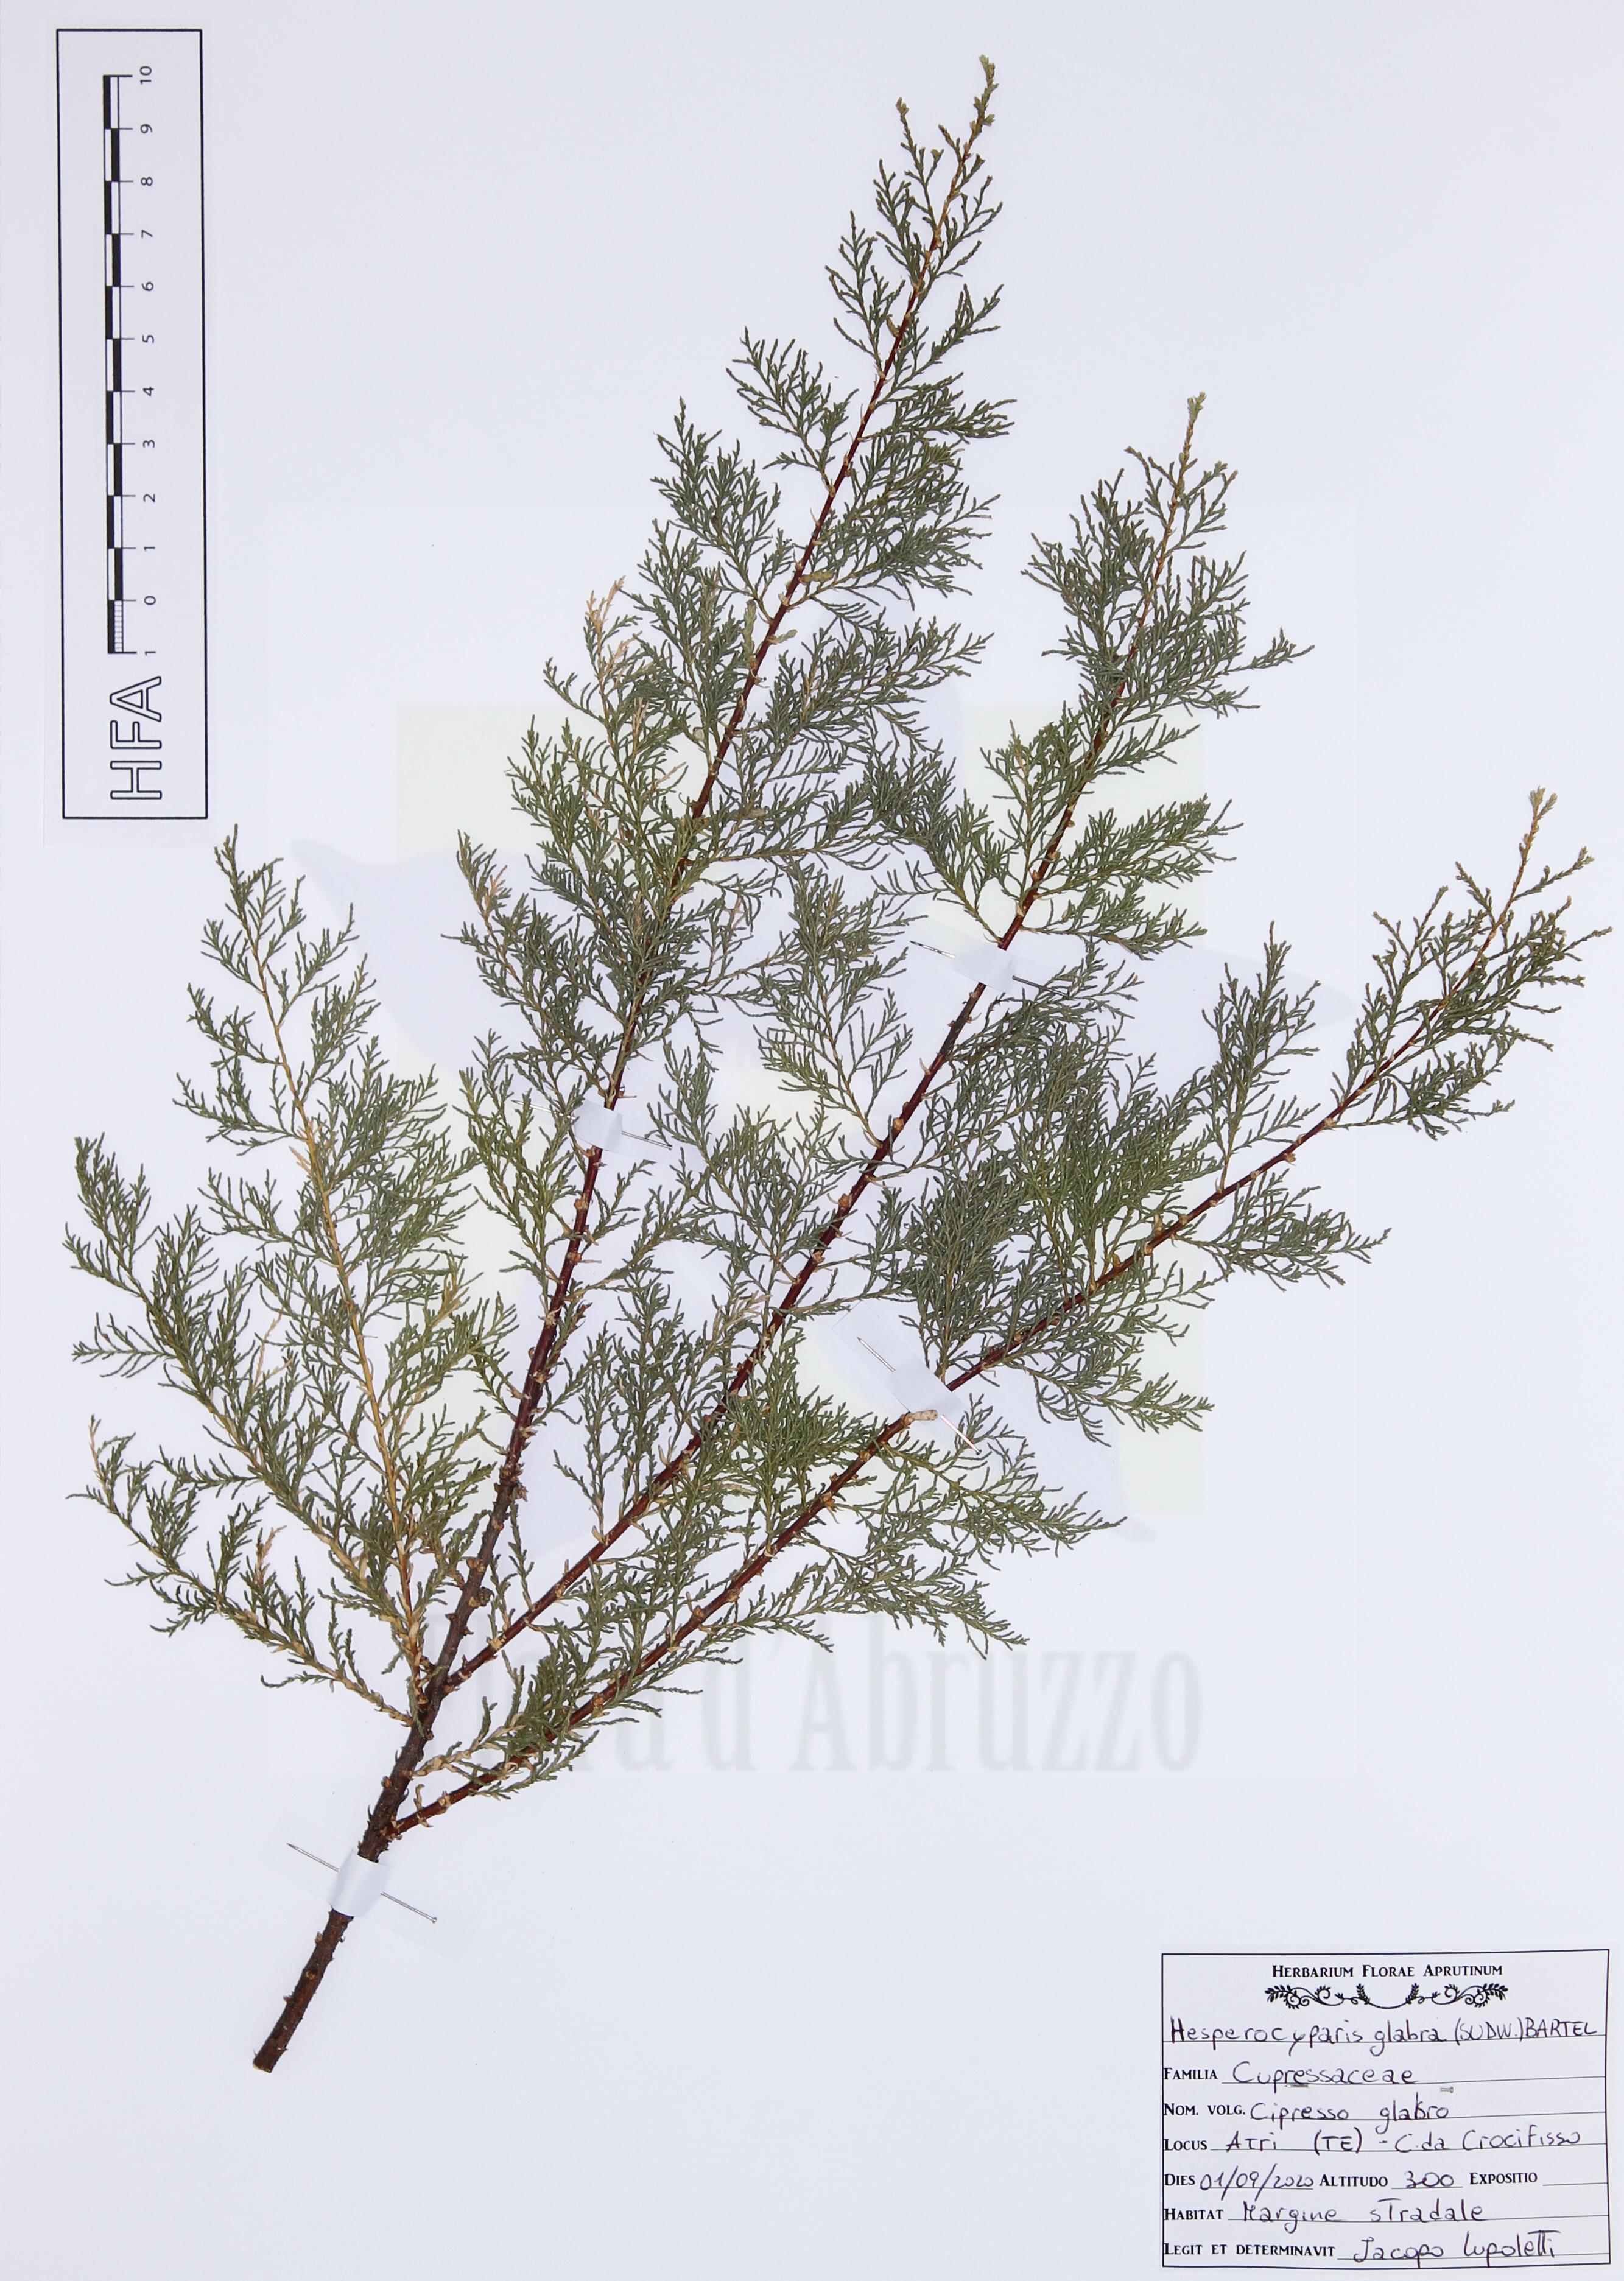 Hesperocyparis glabra(Sudw.) Bartel